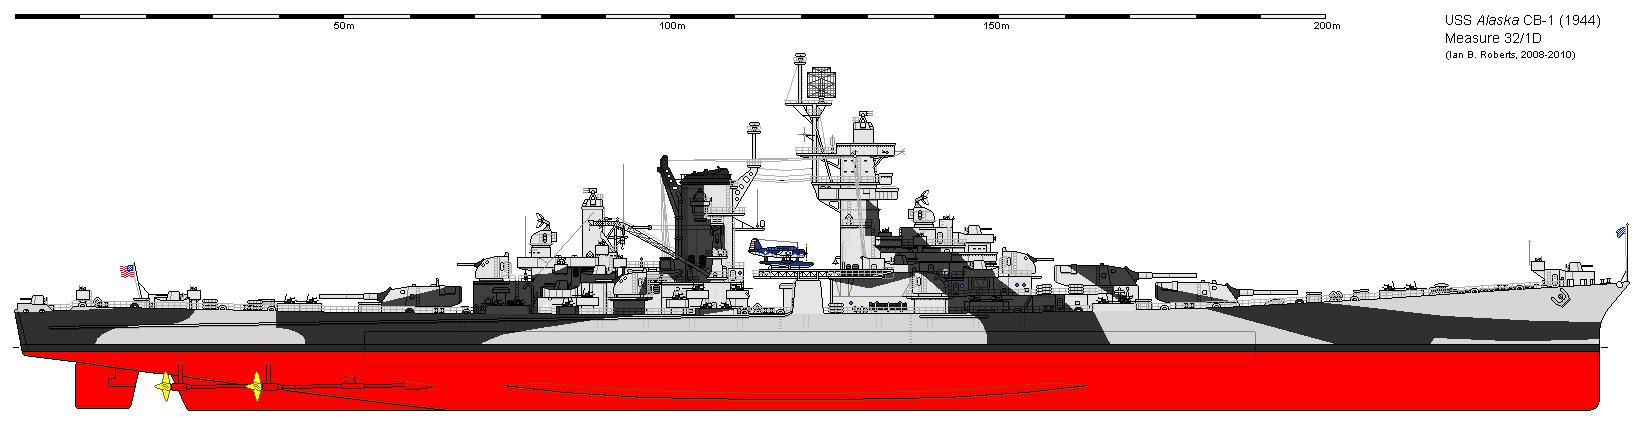 Outboard profile of USS Alaska (CB-1) in 1944. Camouflage paint scheme is USN Measure 32 1D